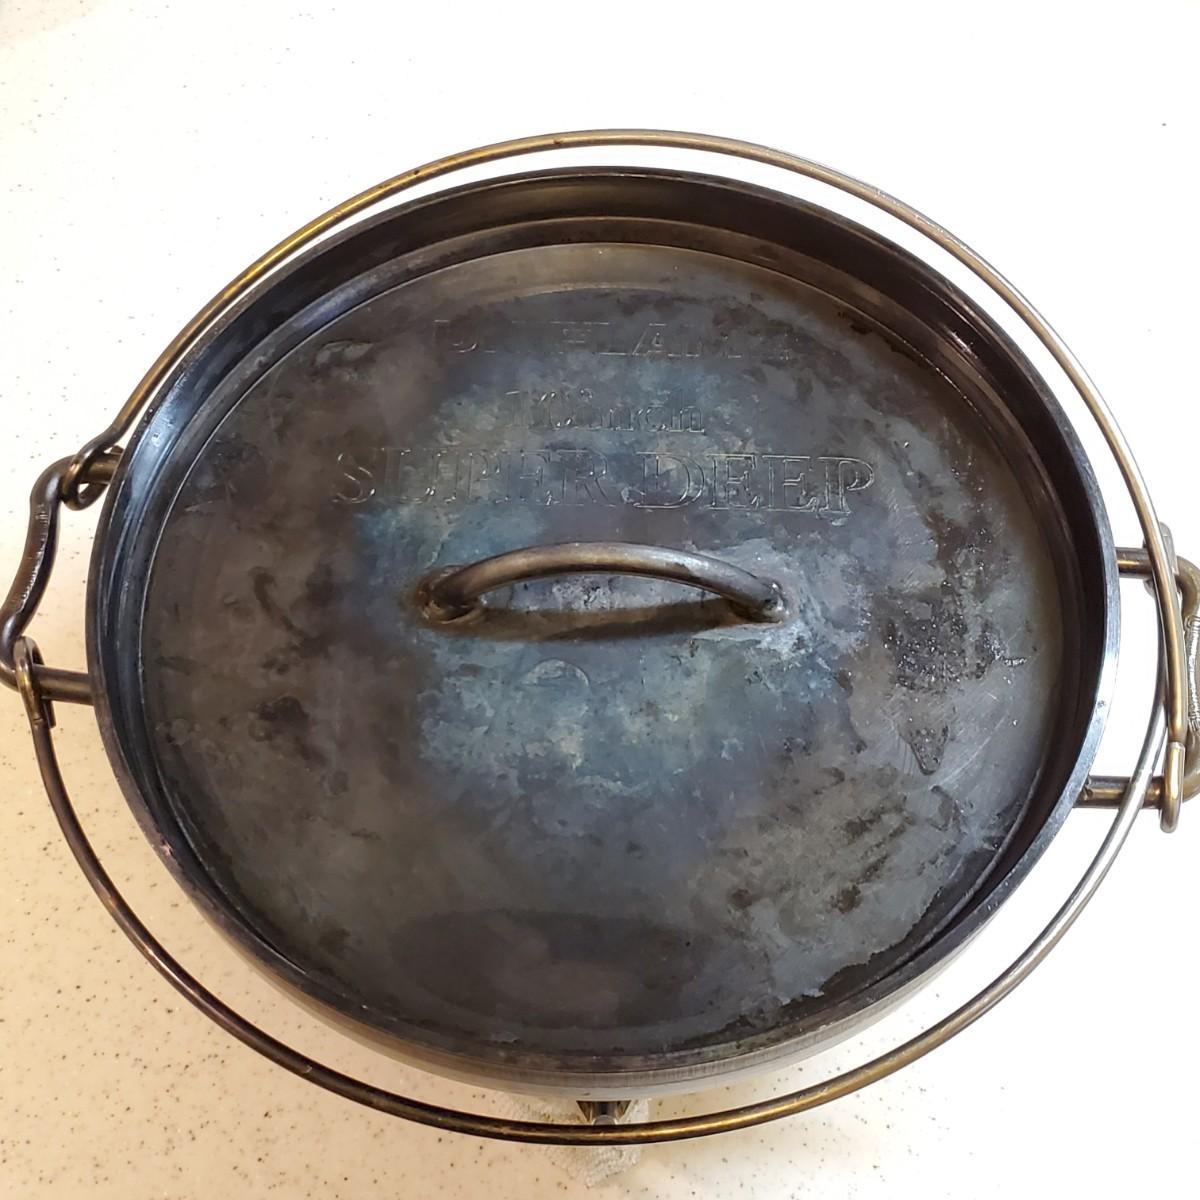 UNIFLAME ユニフレーム ダッチオーブン 10インチ スーパーディープ